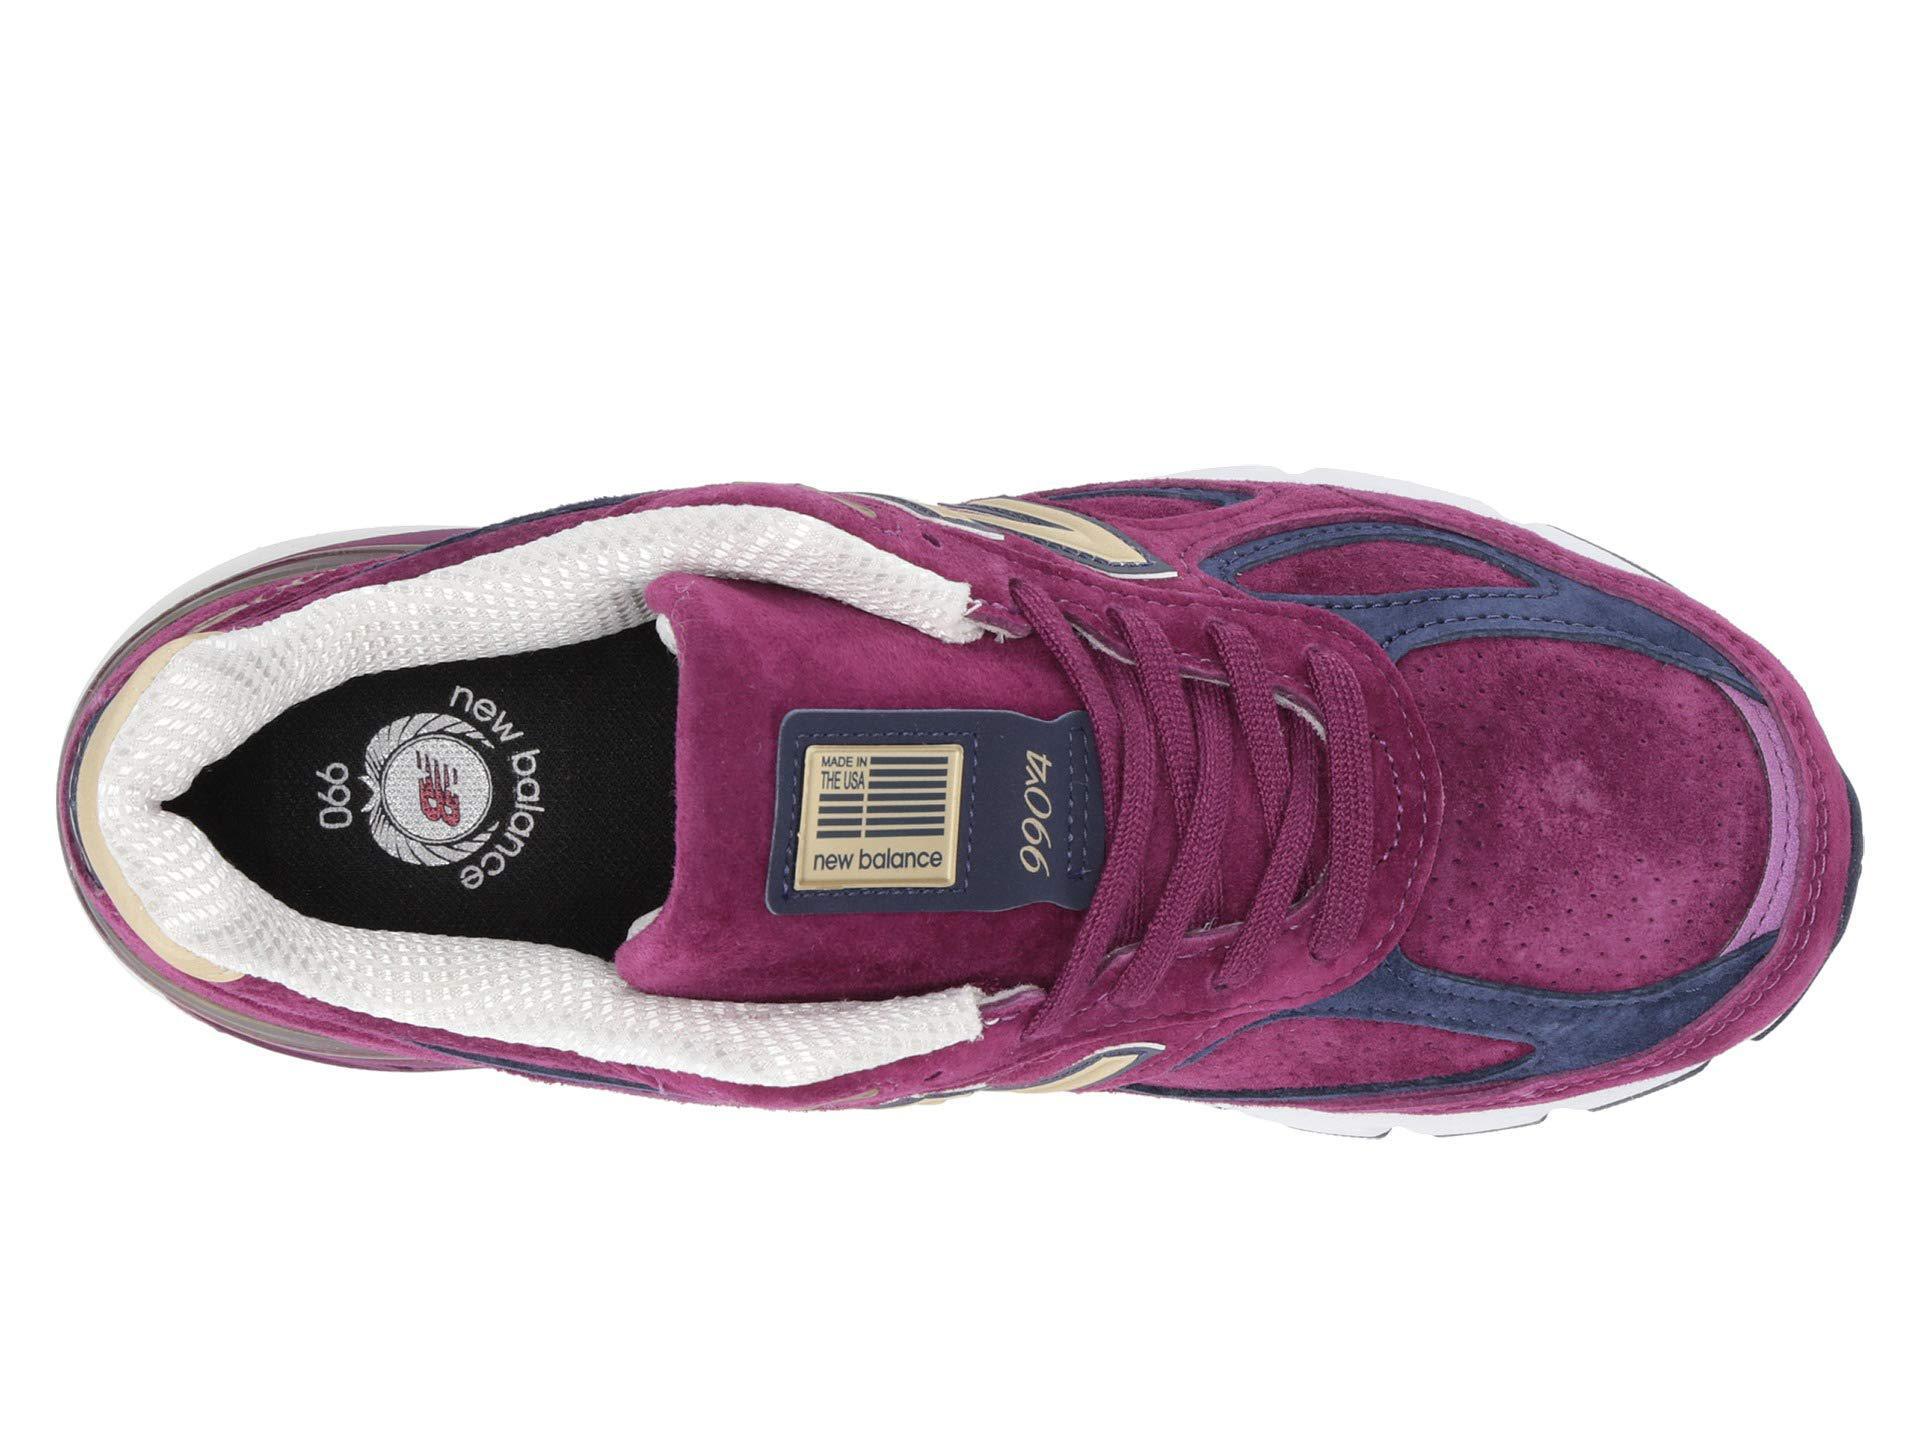 new styles 415f8 73d18 ... Women s Running Shoes - Lyst. View fullscreen